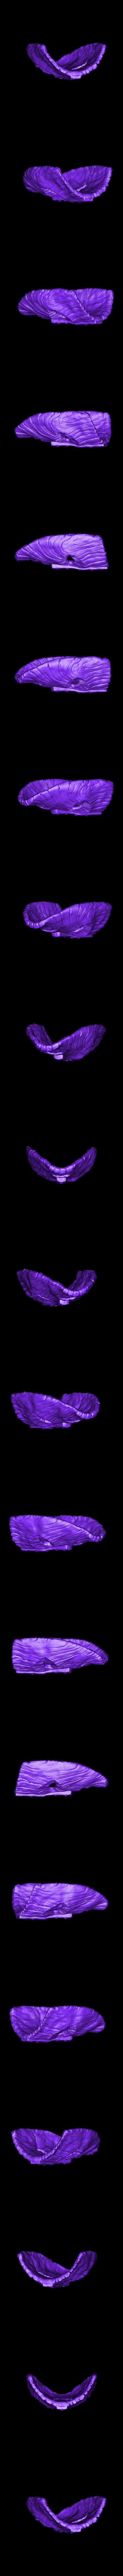 Loki Mask v1 (High quality).stl Download free STL file Loki Mask (Mask movie, Jim Carrey) • 3D printing model, Byambaa